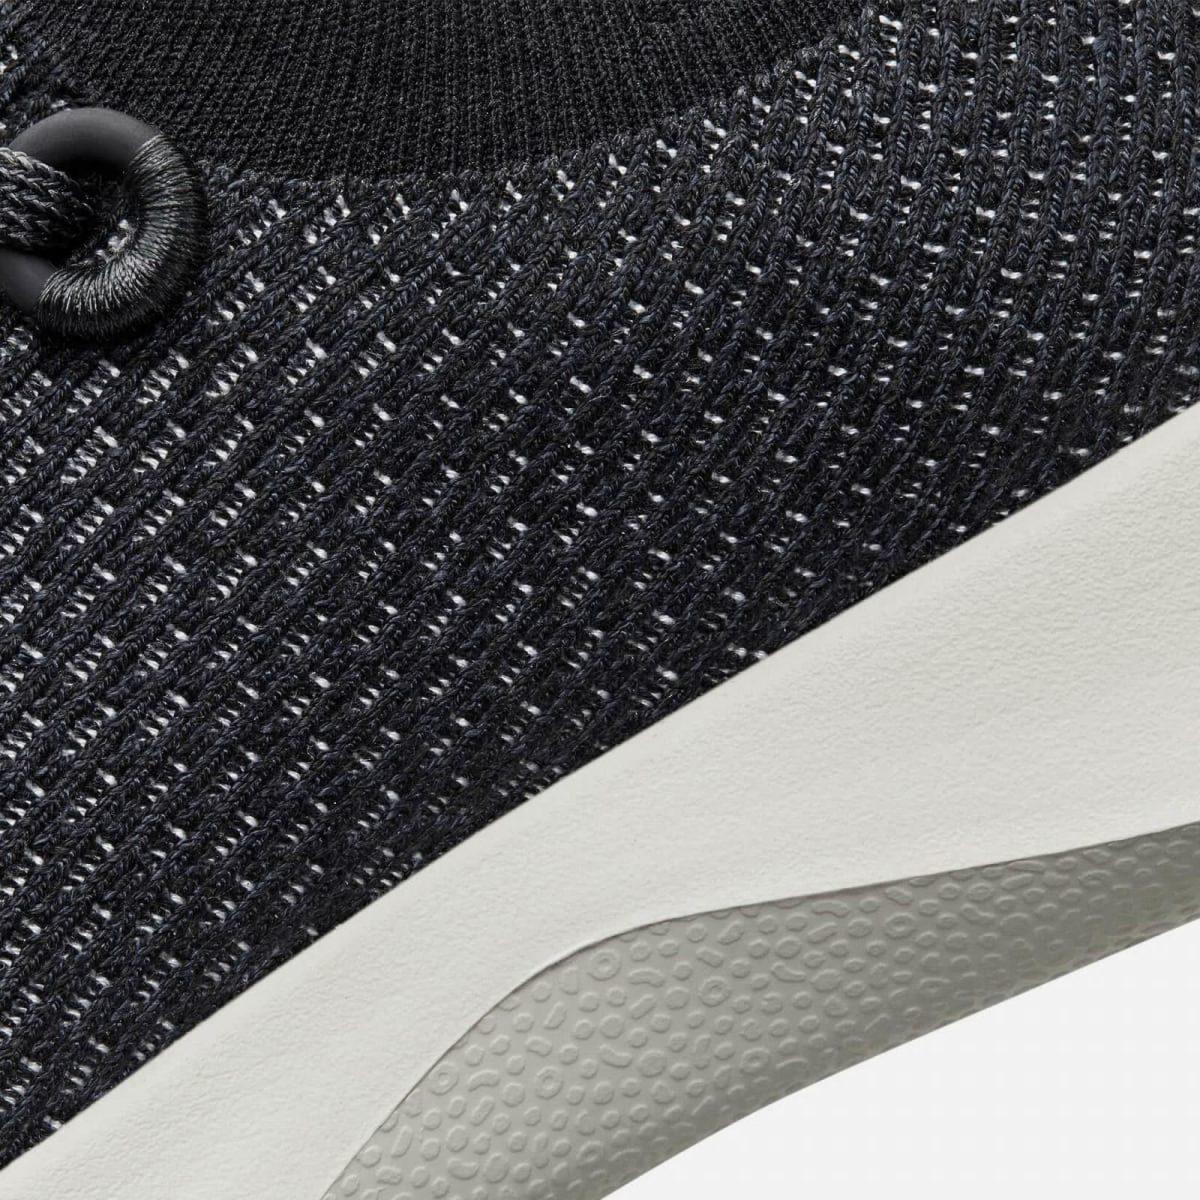 Allbirds sneakers review materials - Luxe Digital